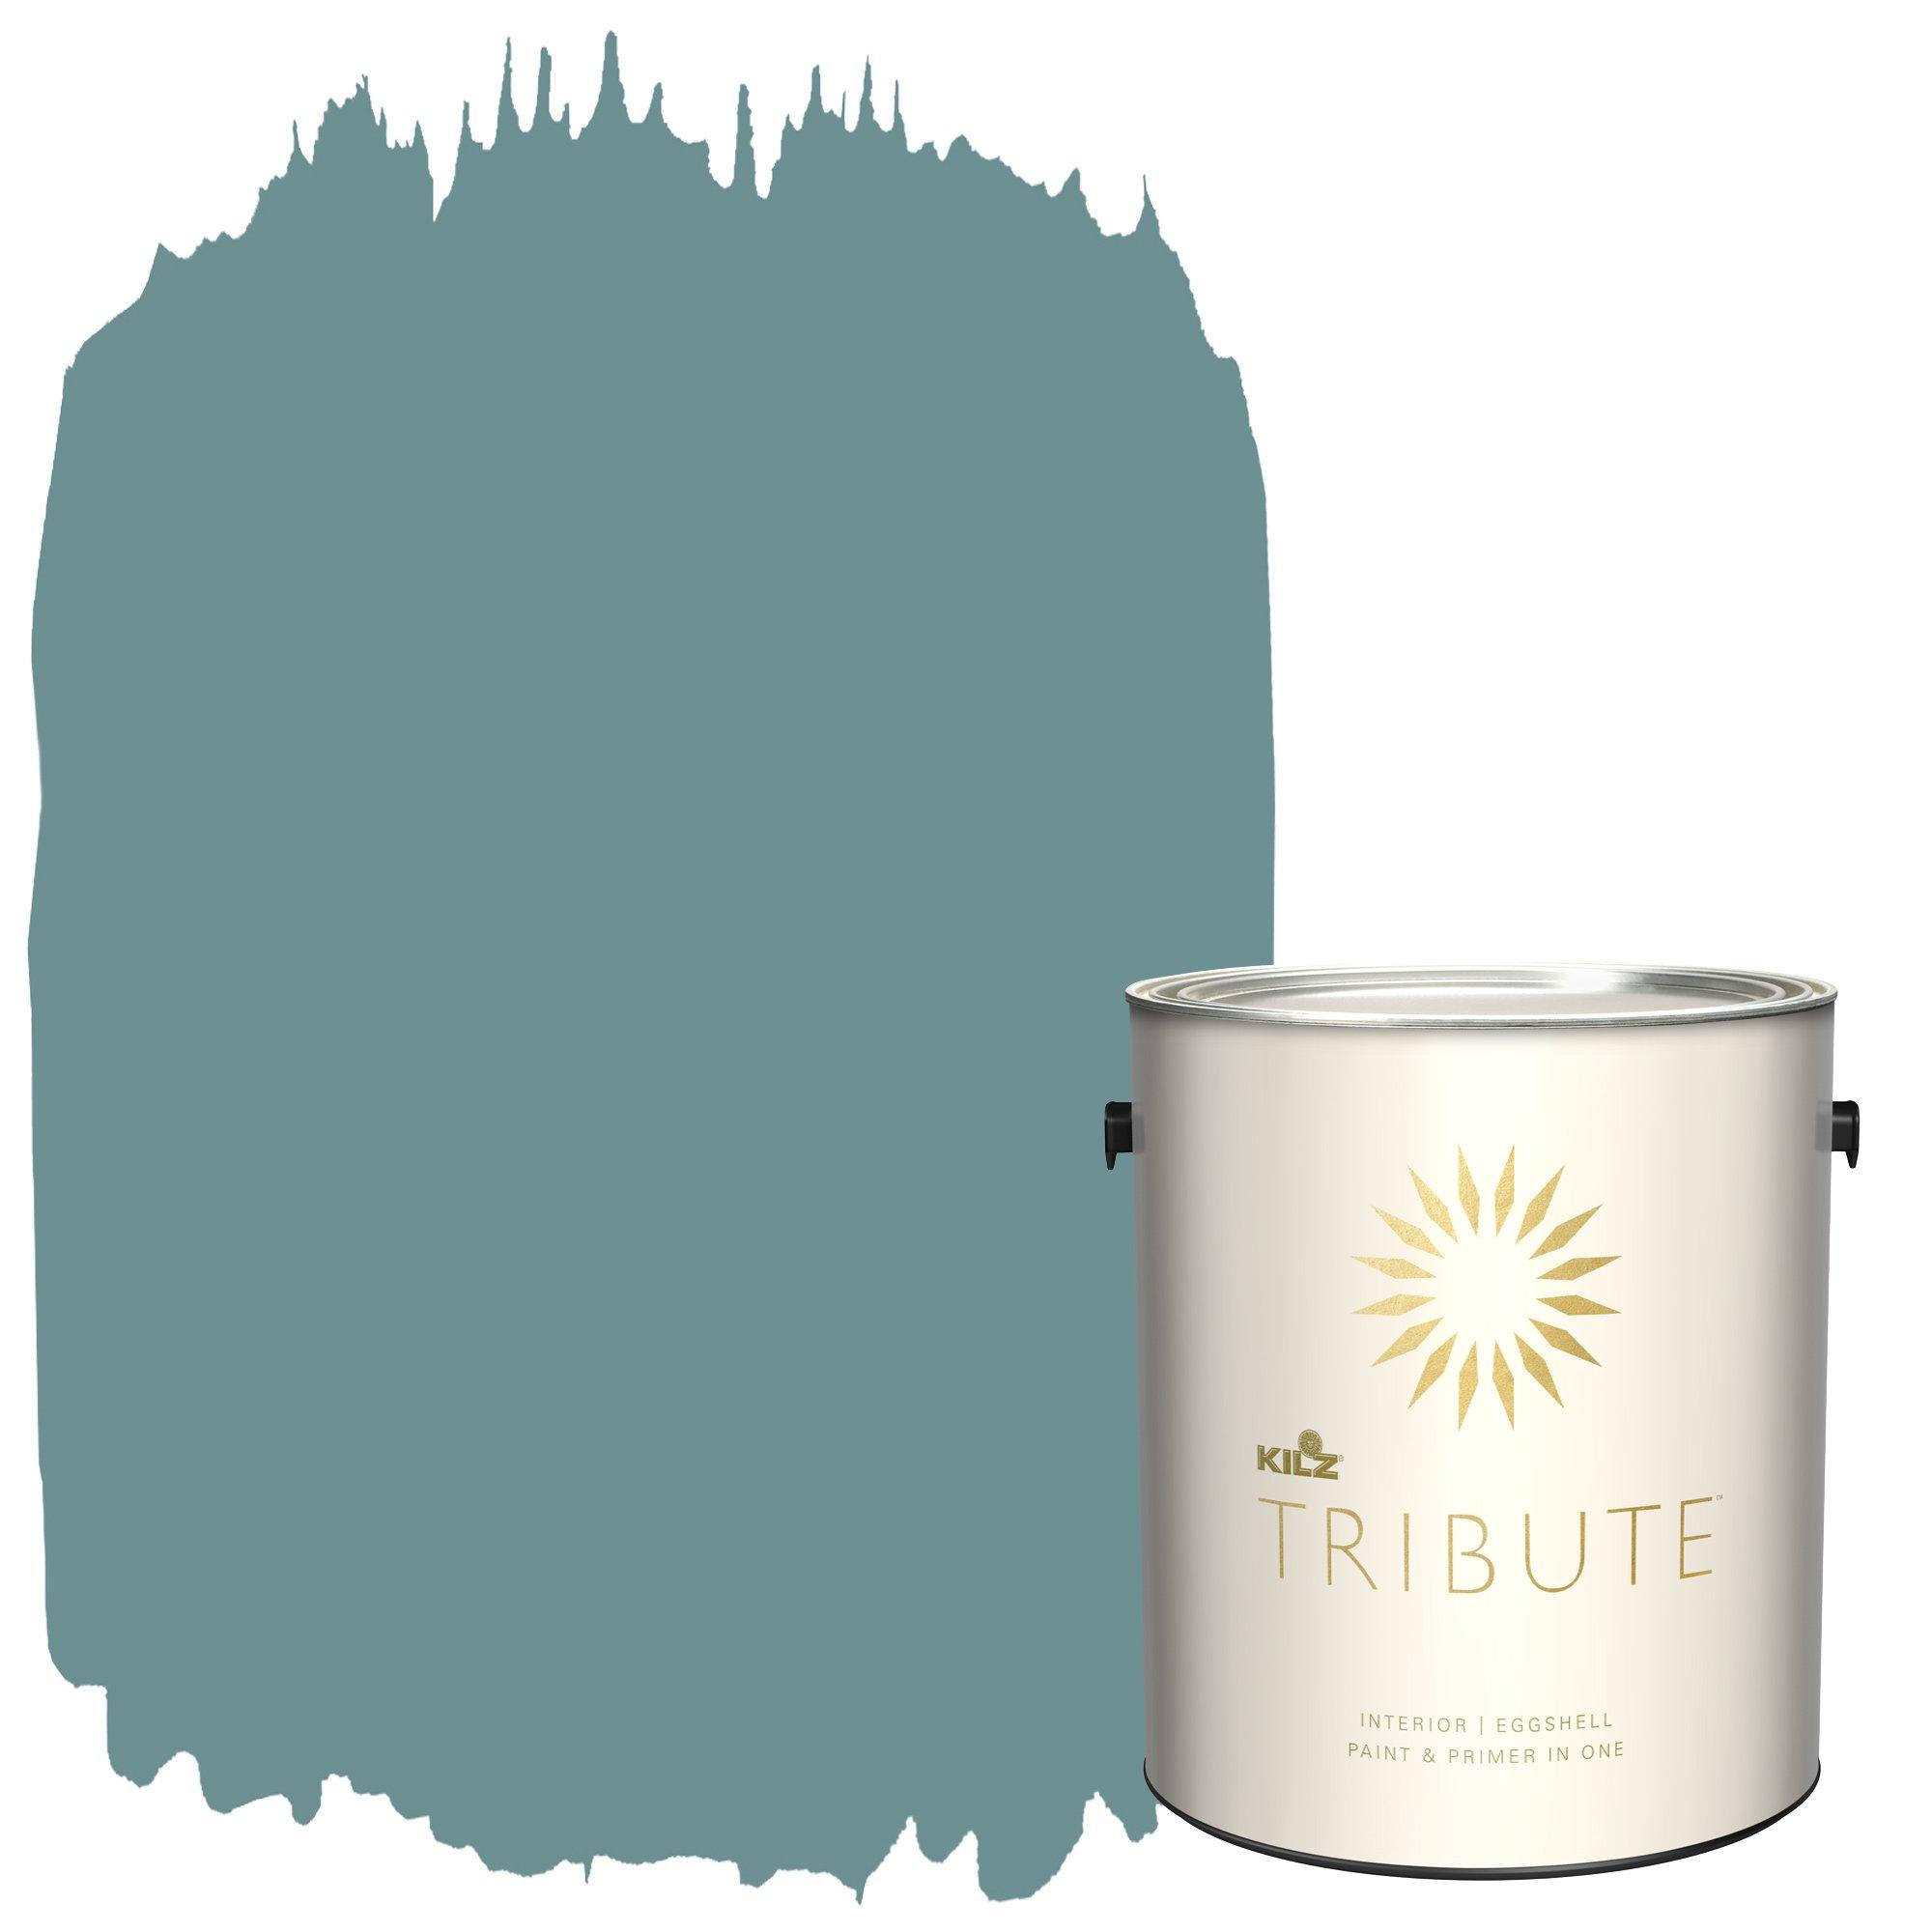 KILZ TRIBUTE Interior Eggshell Paint and Primer in One, 1 Gallon, Pale Emerald (TB-57)